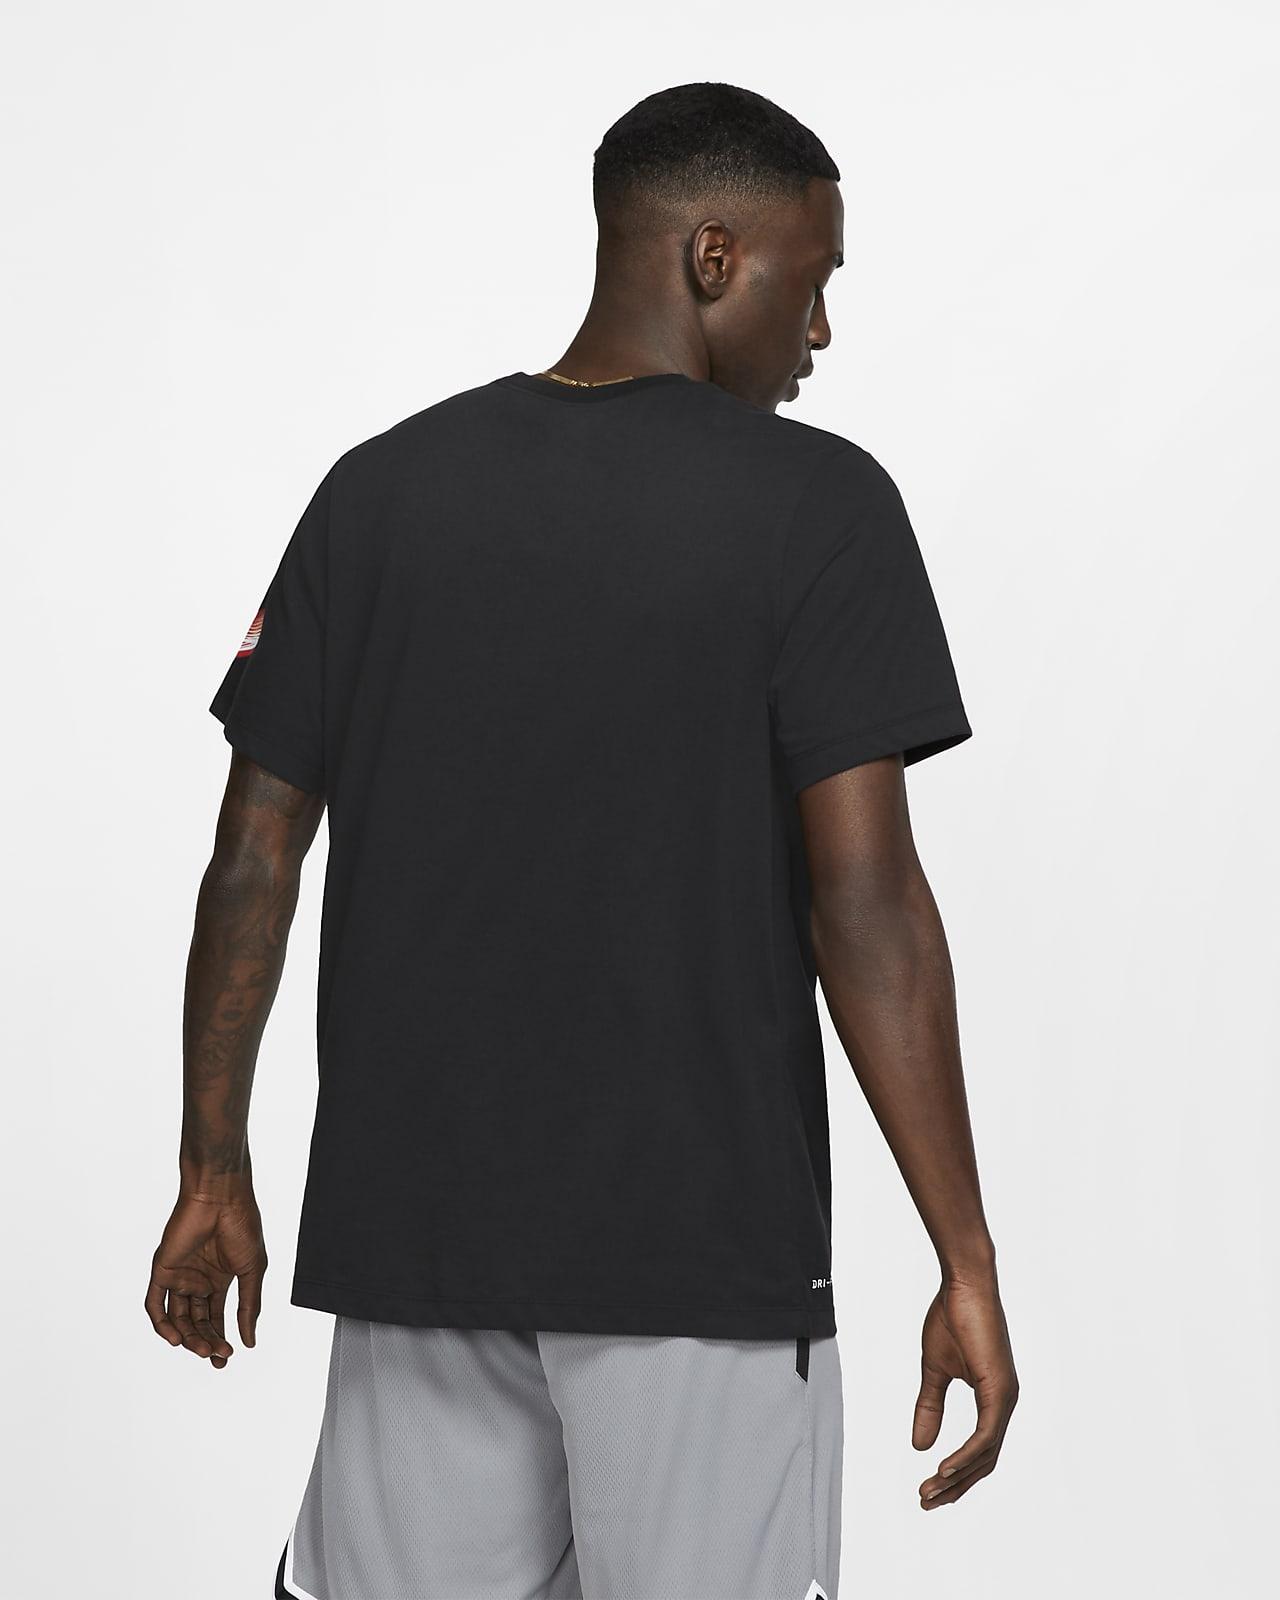 Nike Dri-FIT Kyrie Men's T-Shirt